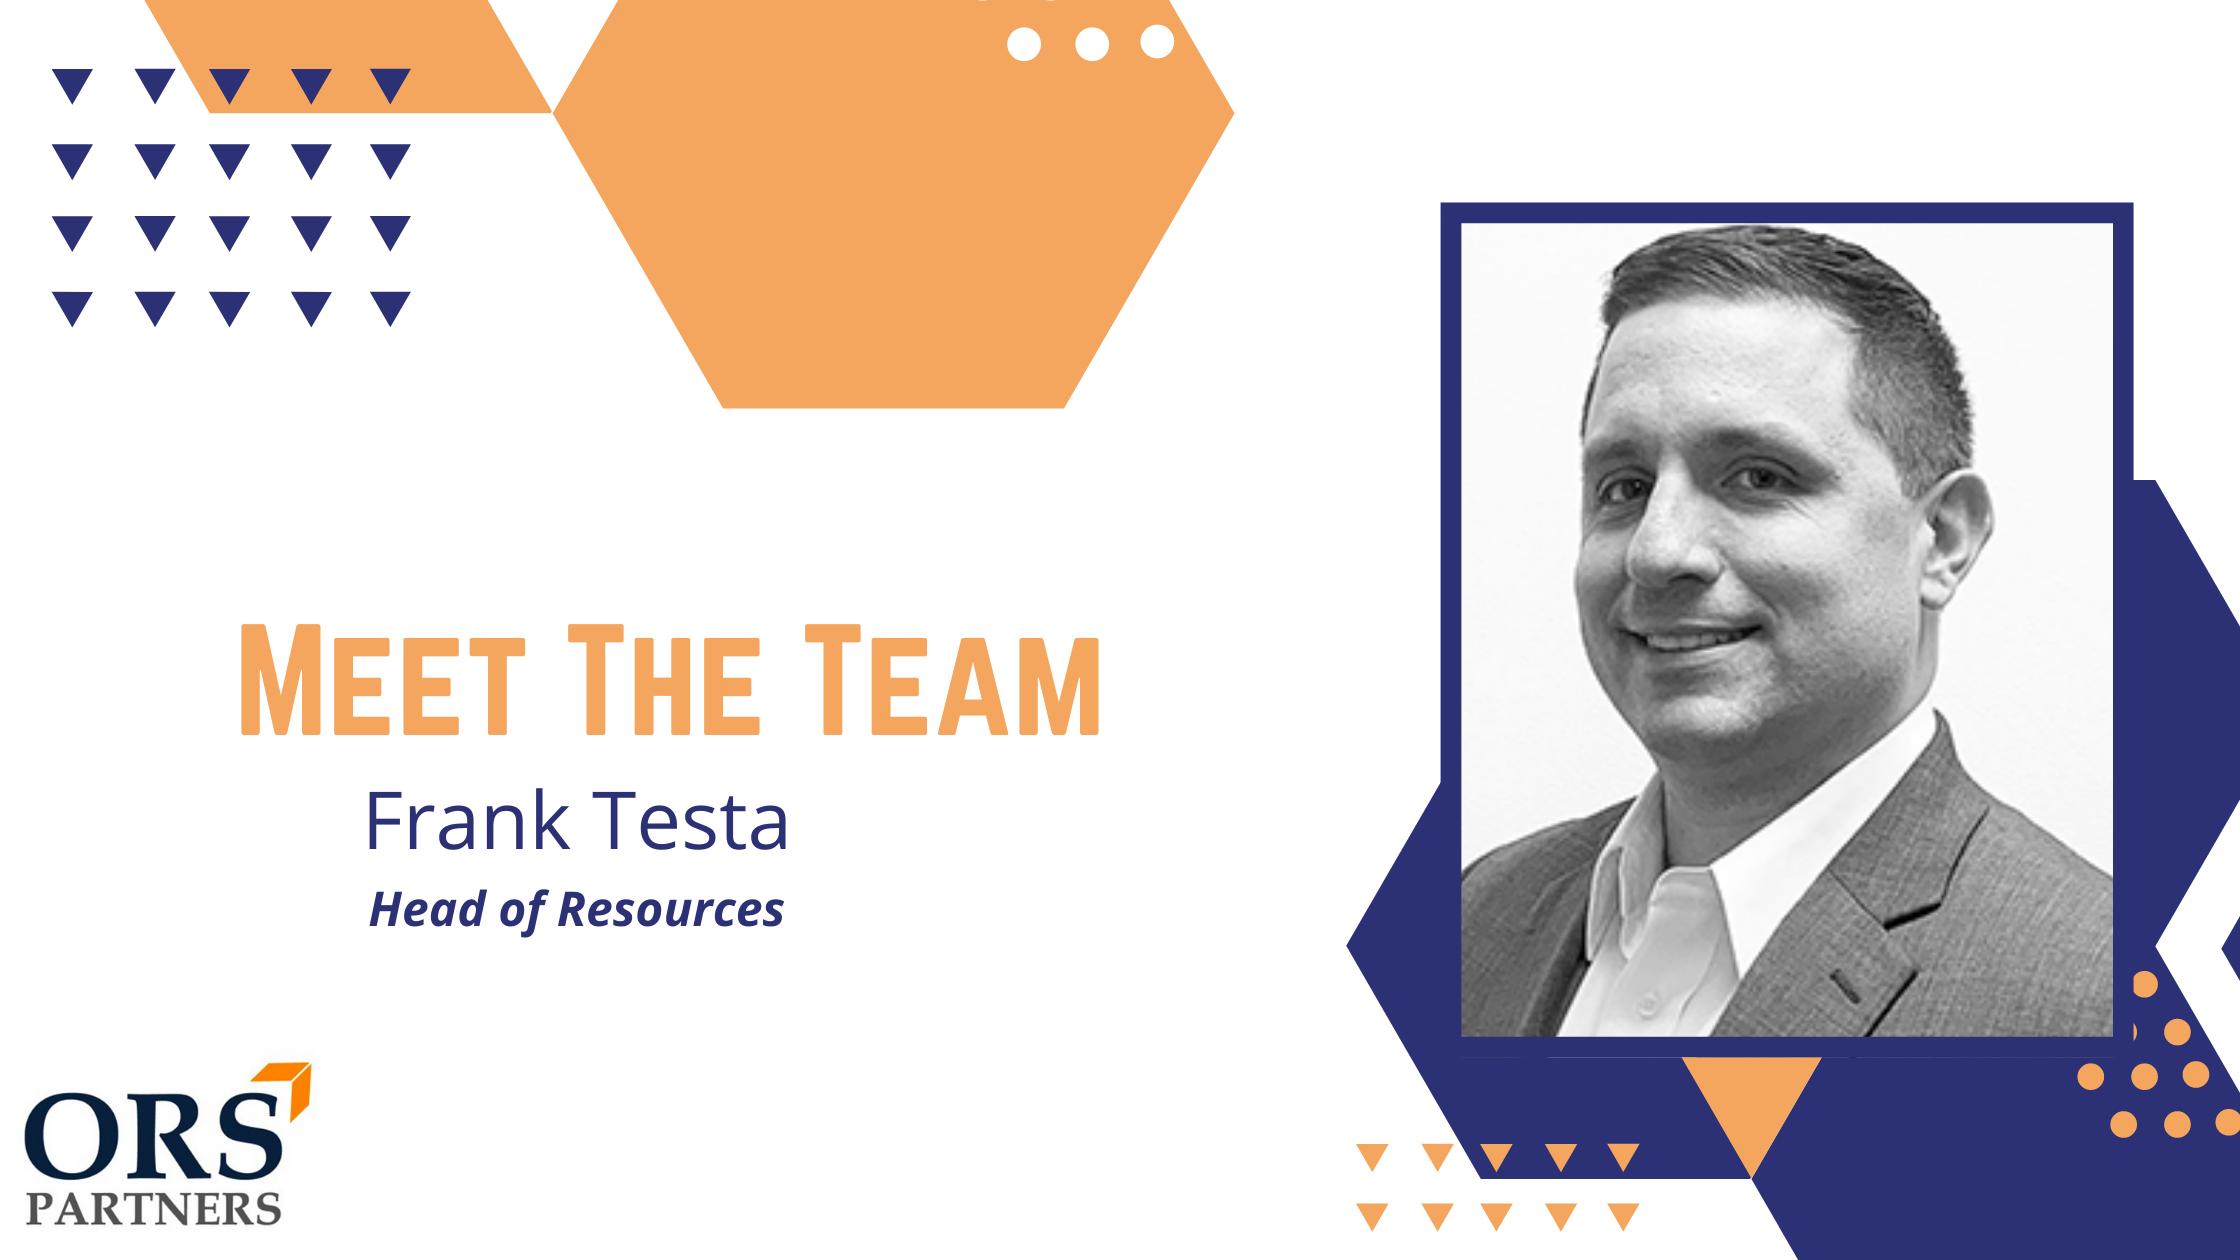 Meet the Team: Frank Testa